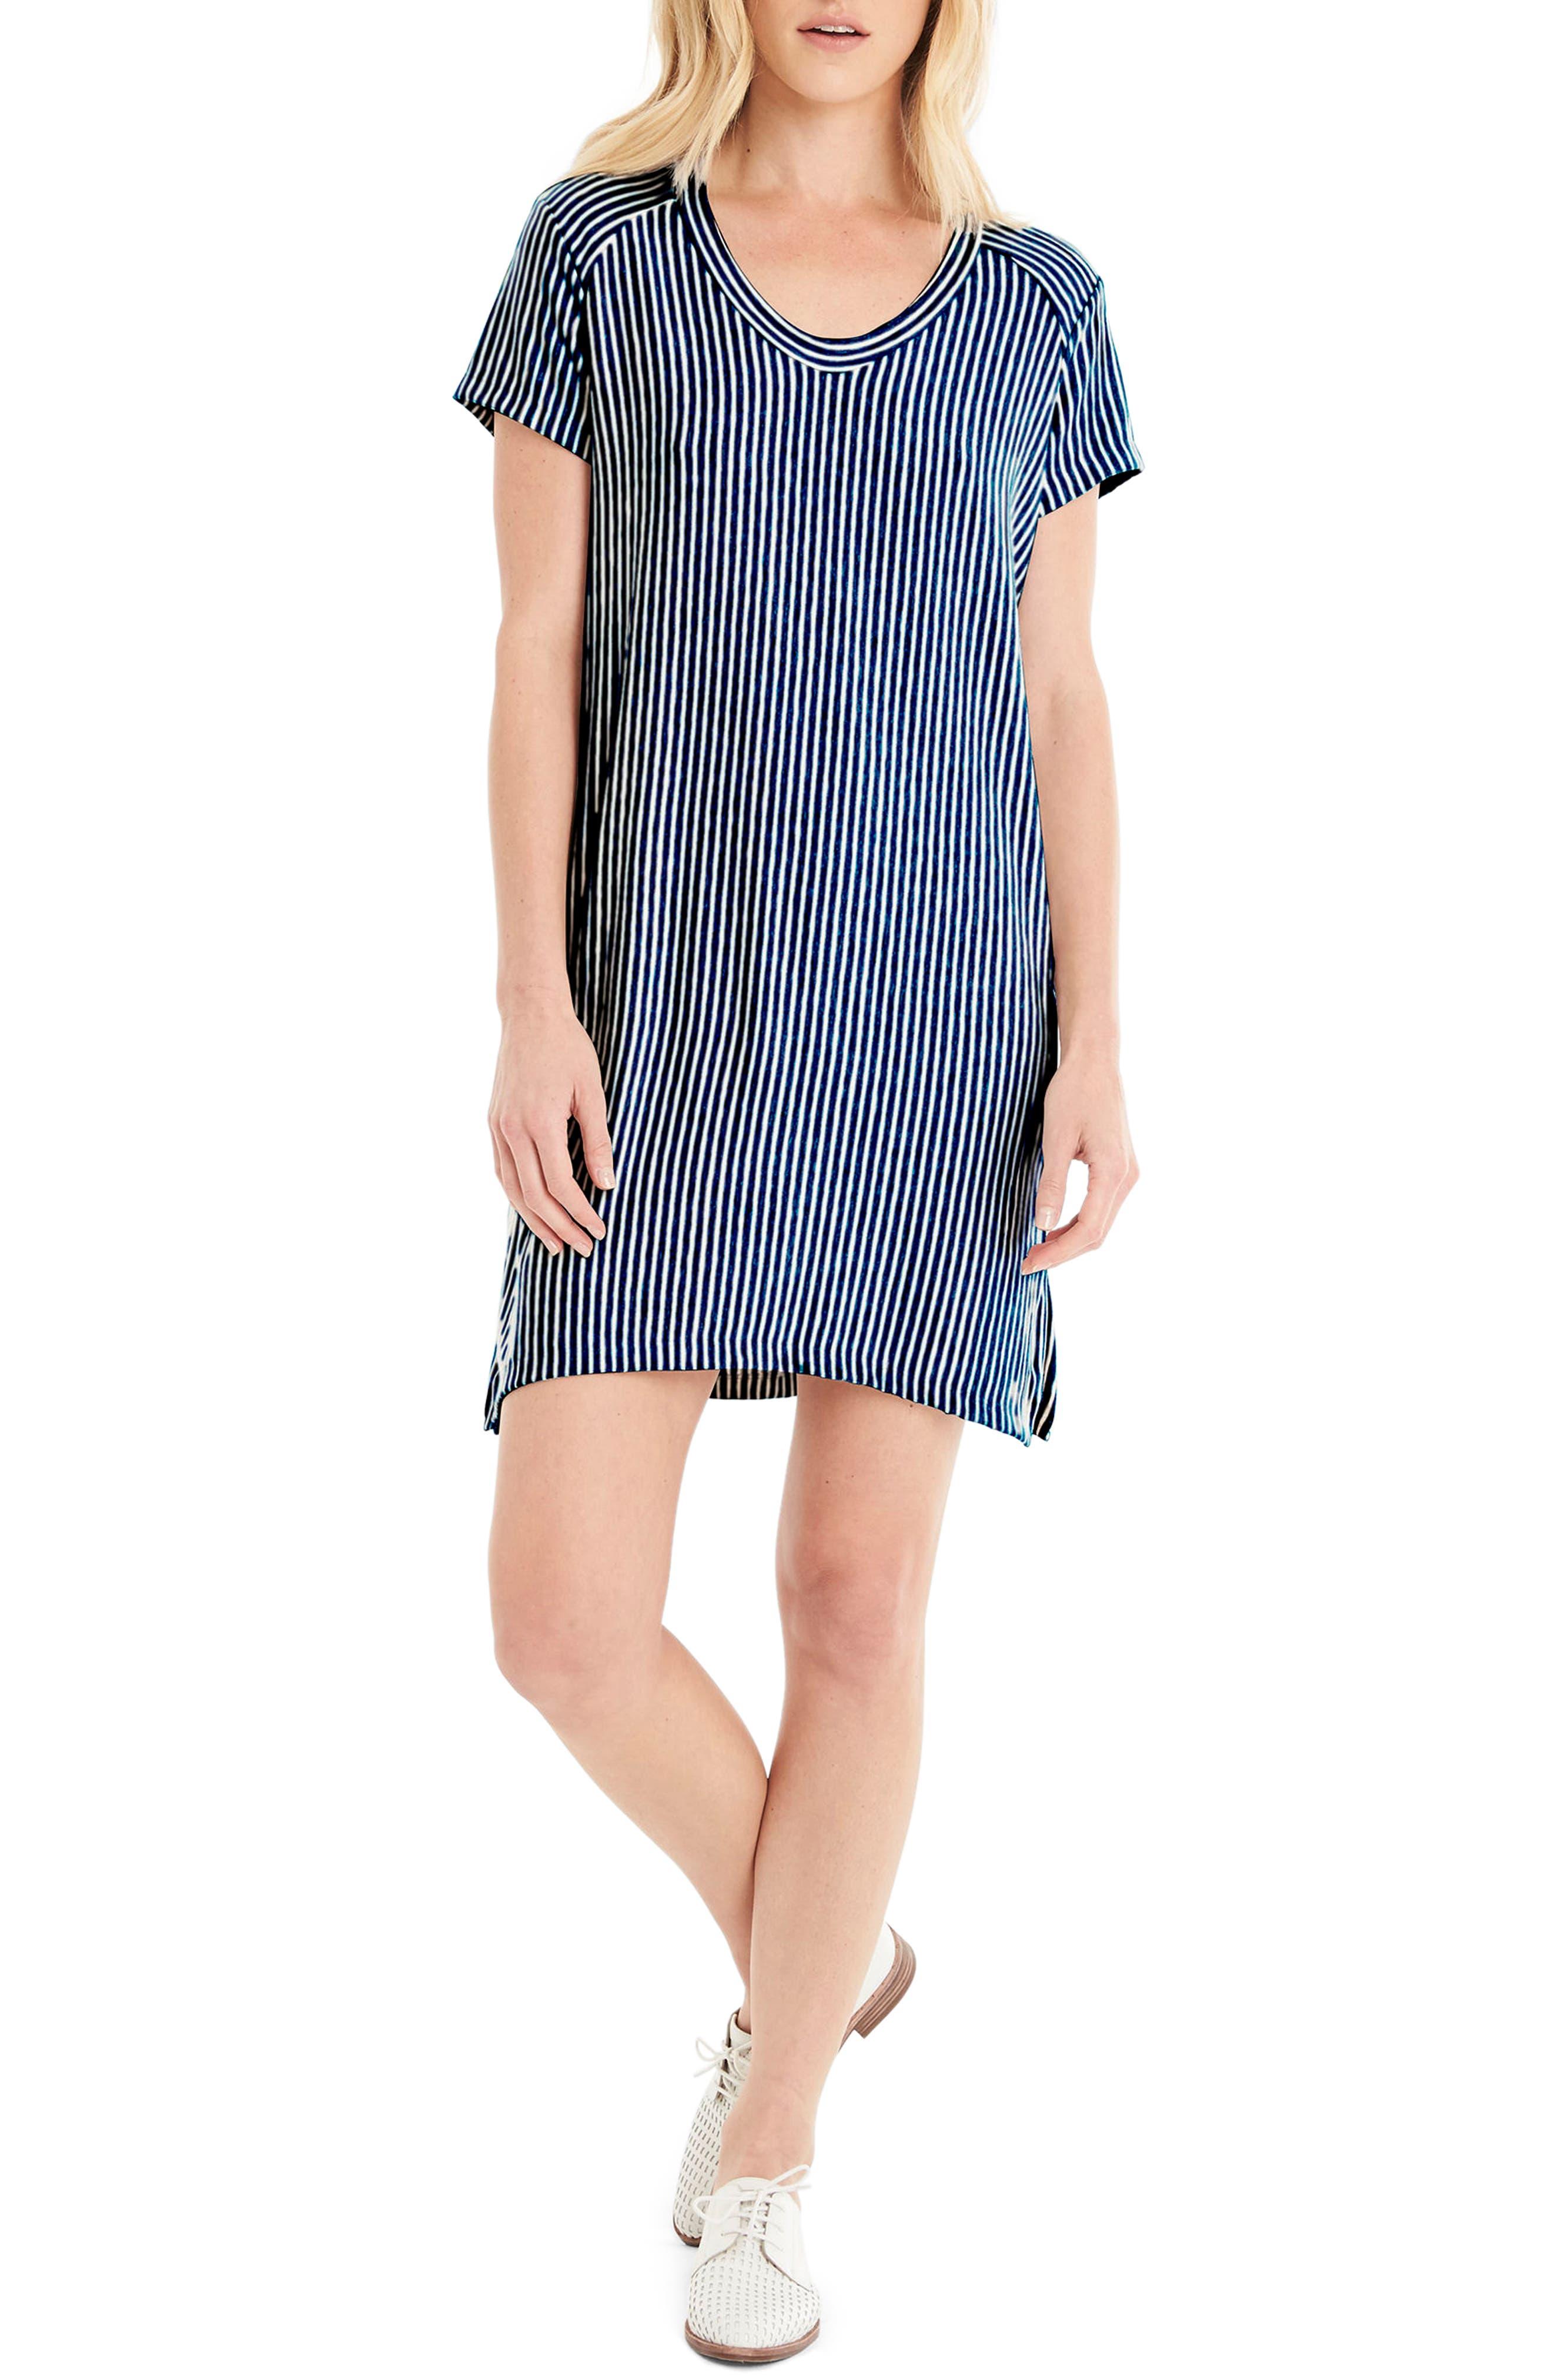 Alternate Image 1 Selected - Michael Stars Stripe Sweatshirt Dress